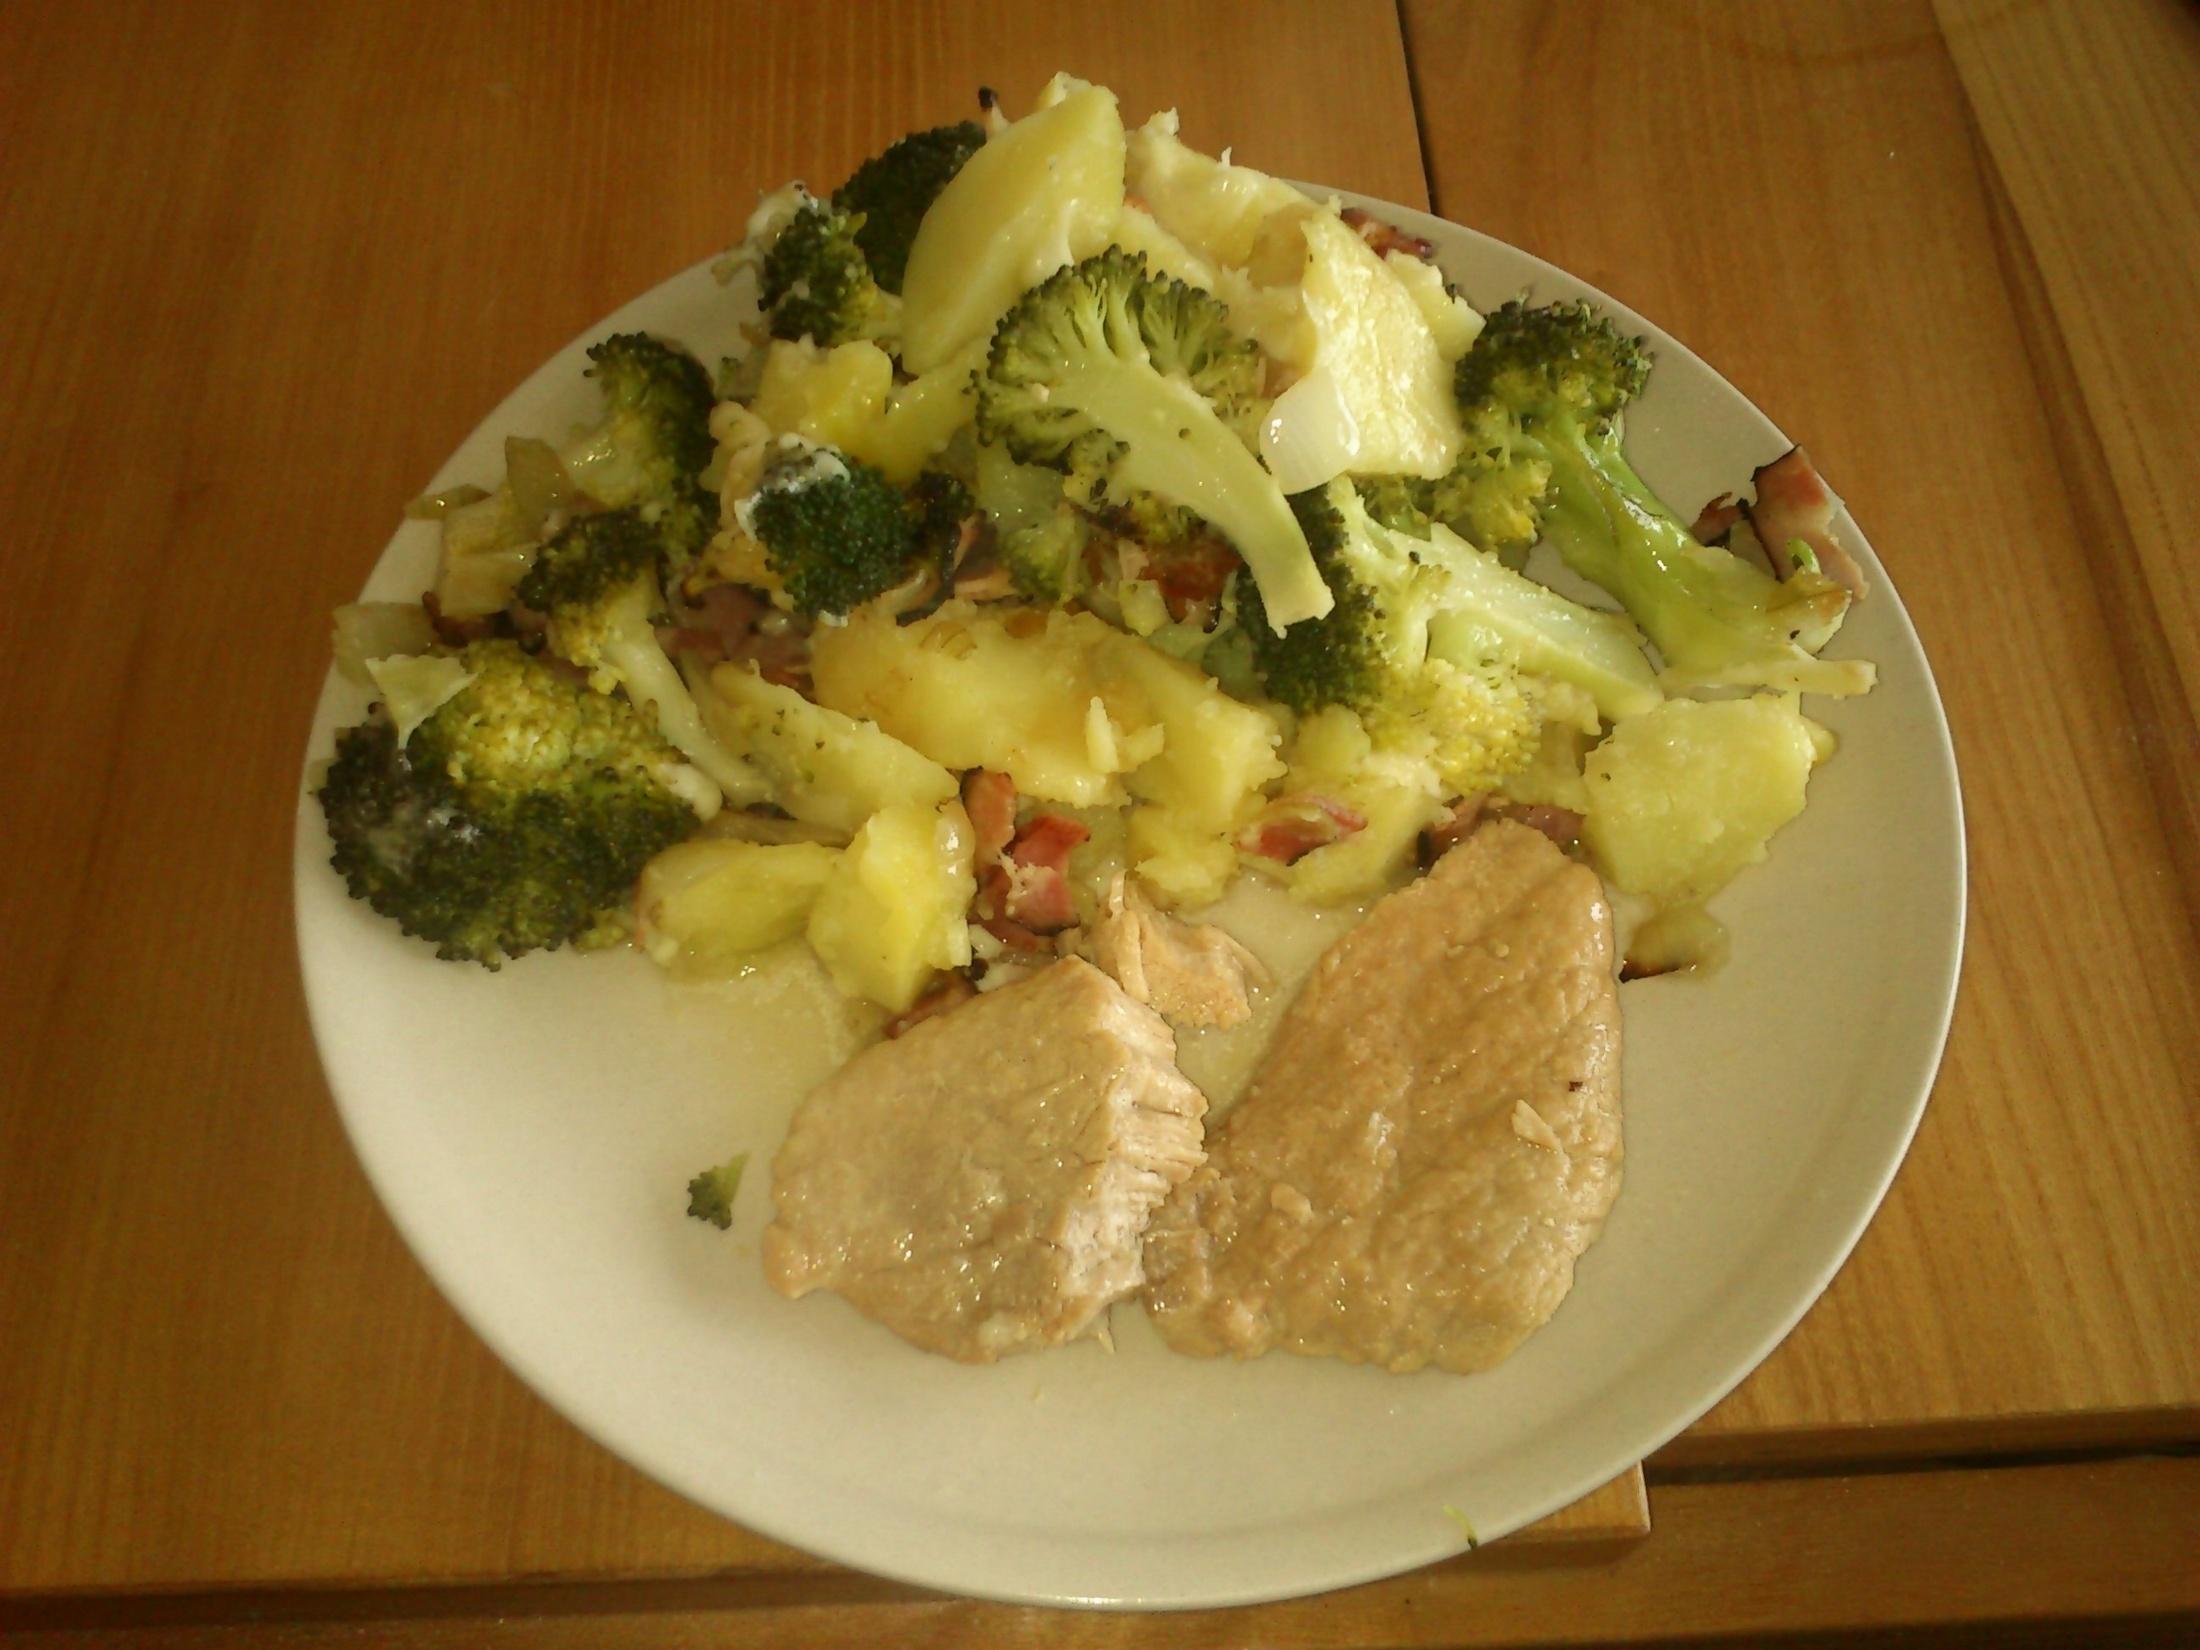 Zapečené brambory s mletým masem a brokolicí